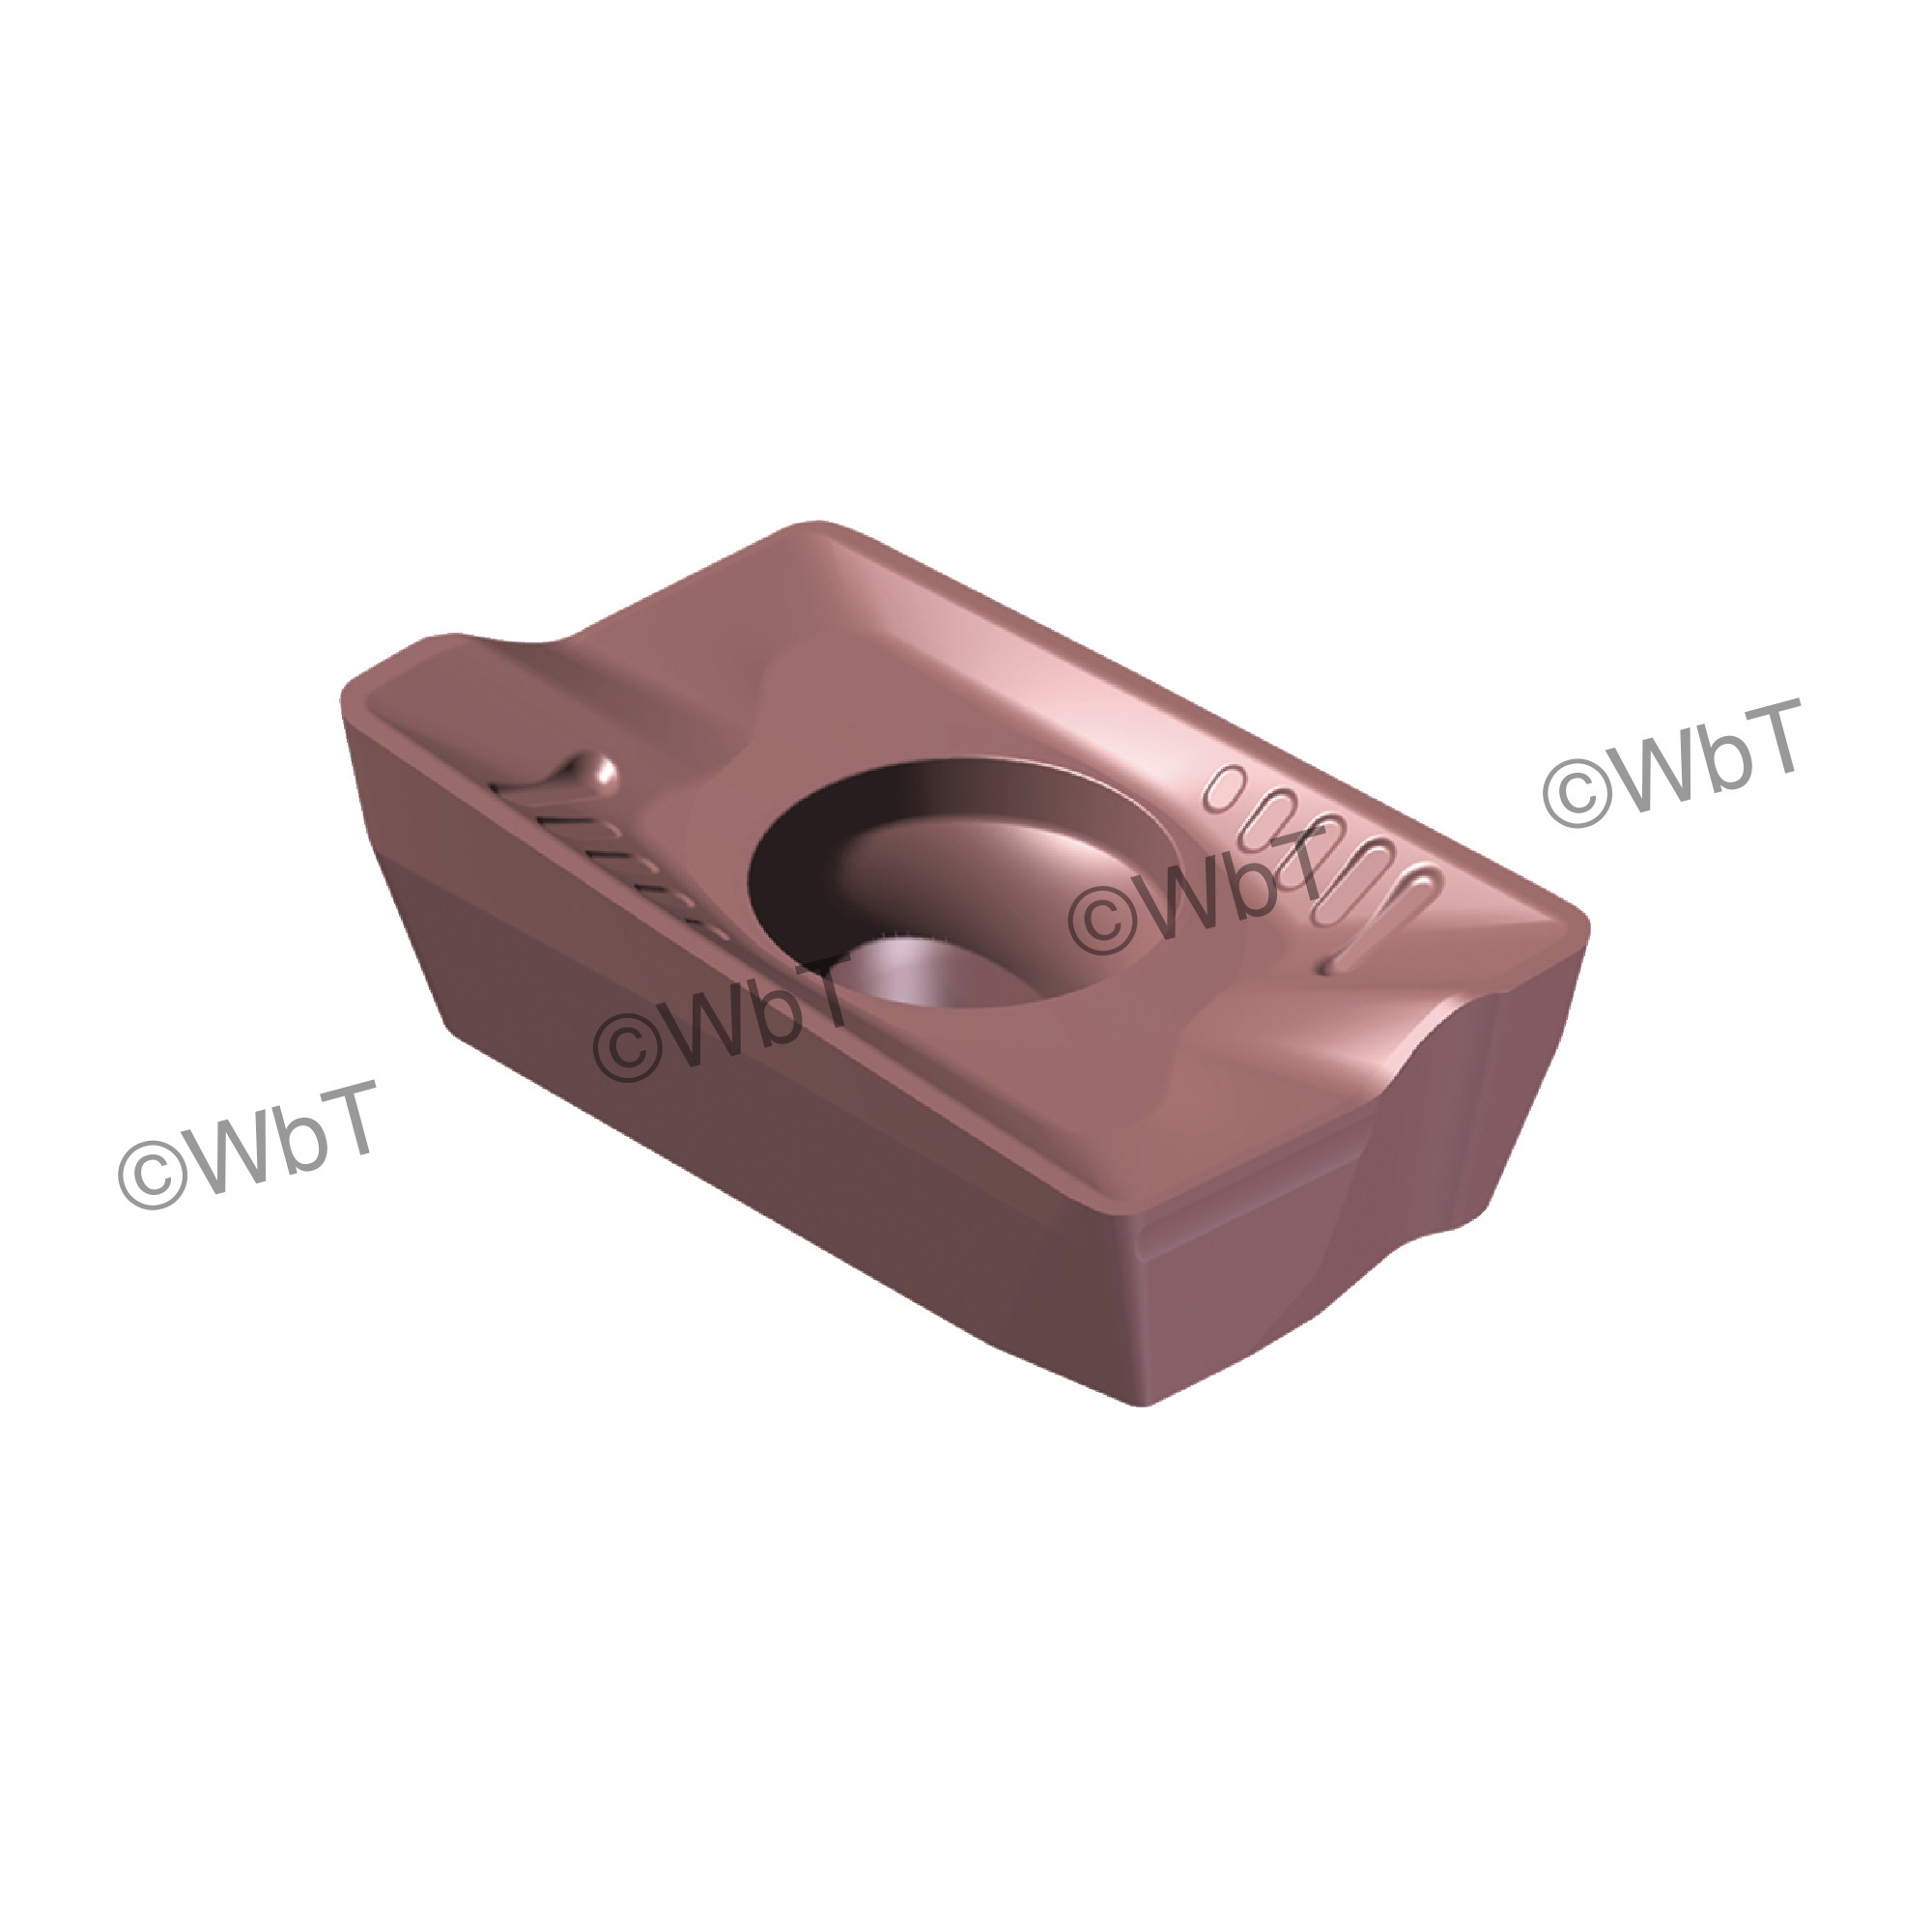 AKUMA - APKT1604PDR-R1 PM15K Parallelogram / Indexable Carbide Milling Insert